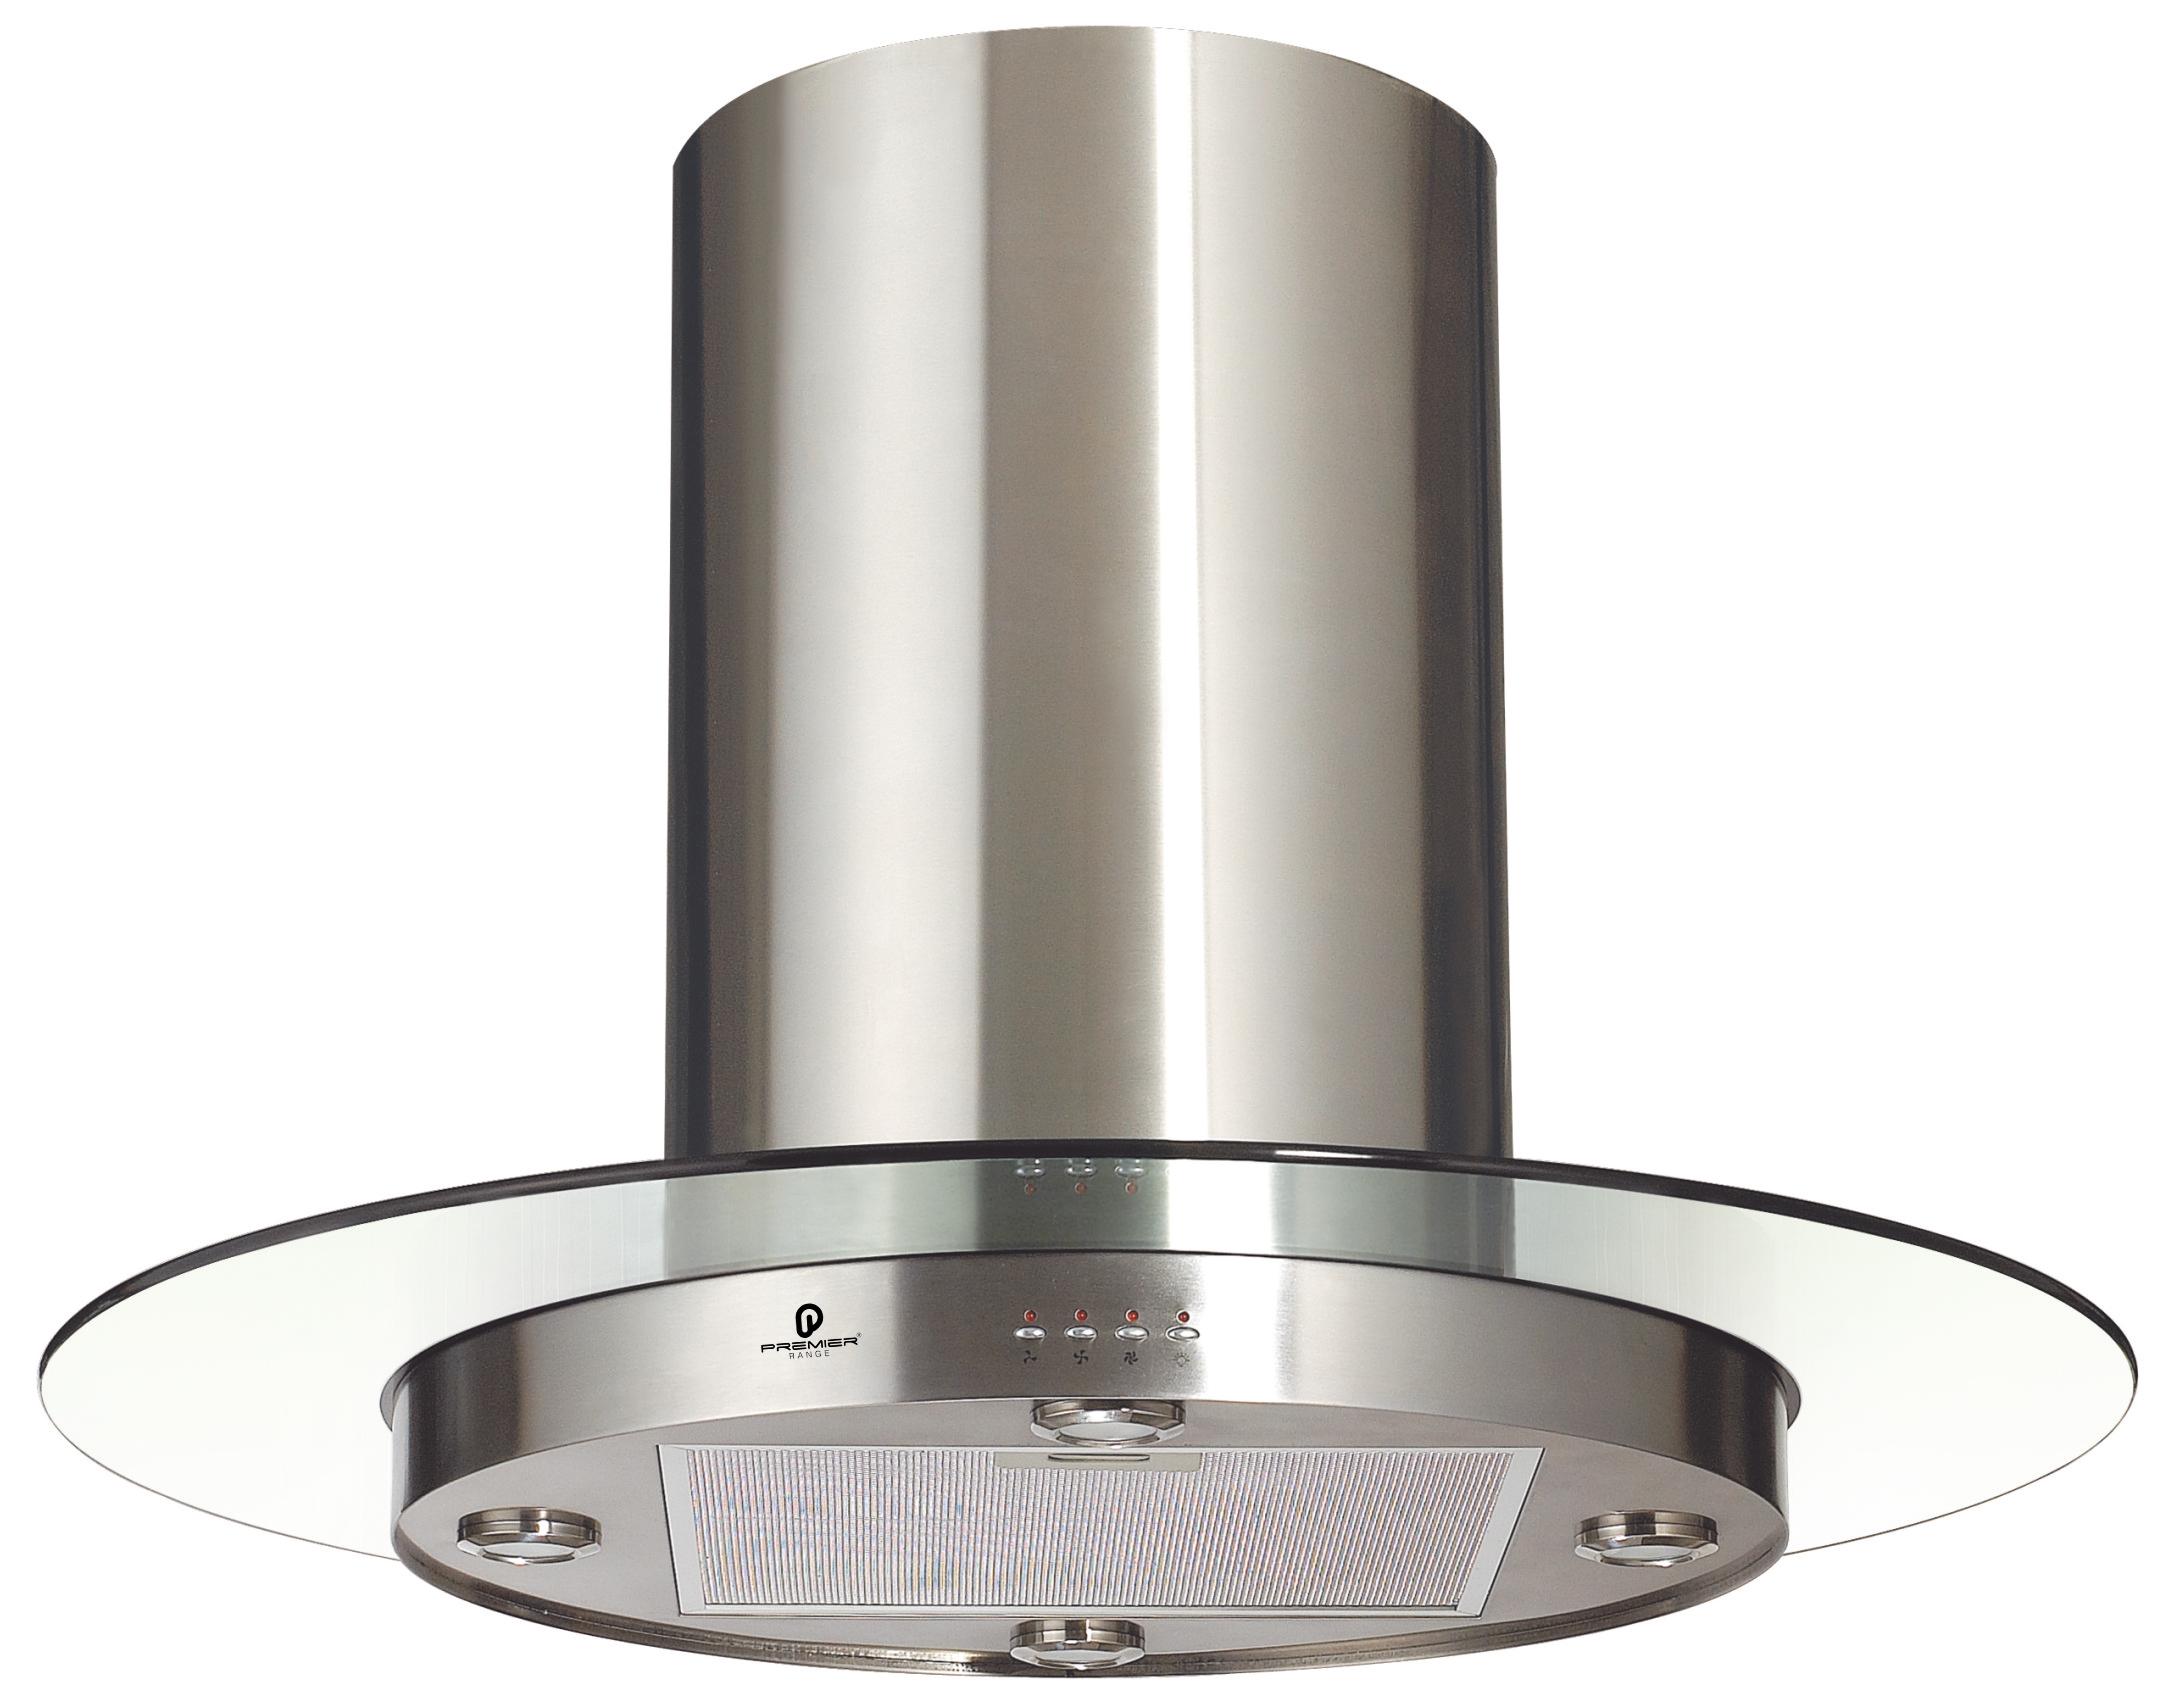 Round Chimneys With Hoods ~ Round island chimney latest smoke glass cooker hood cm